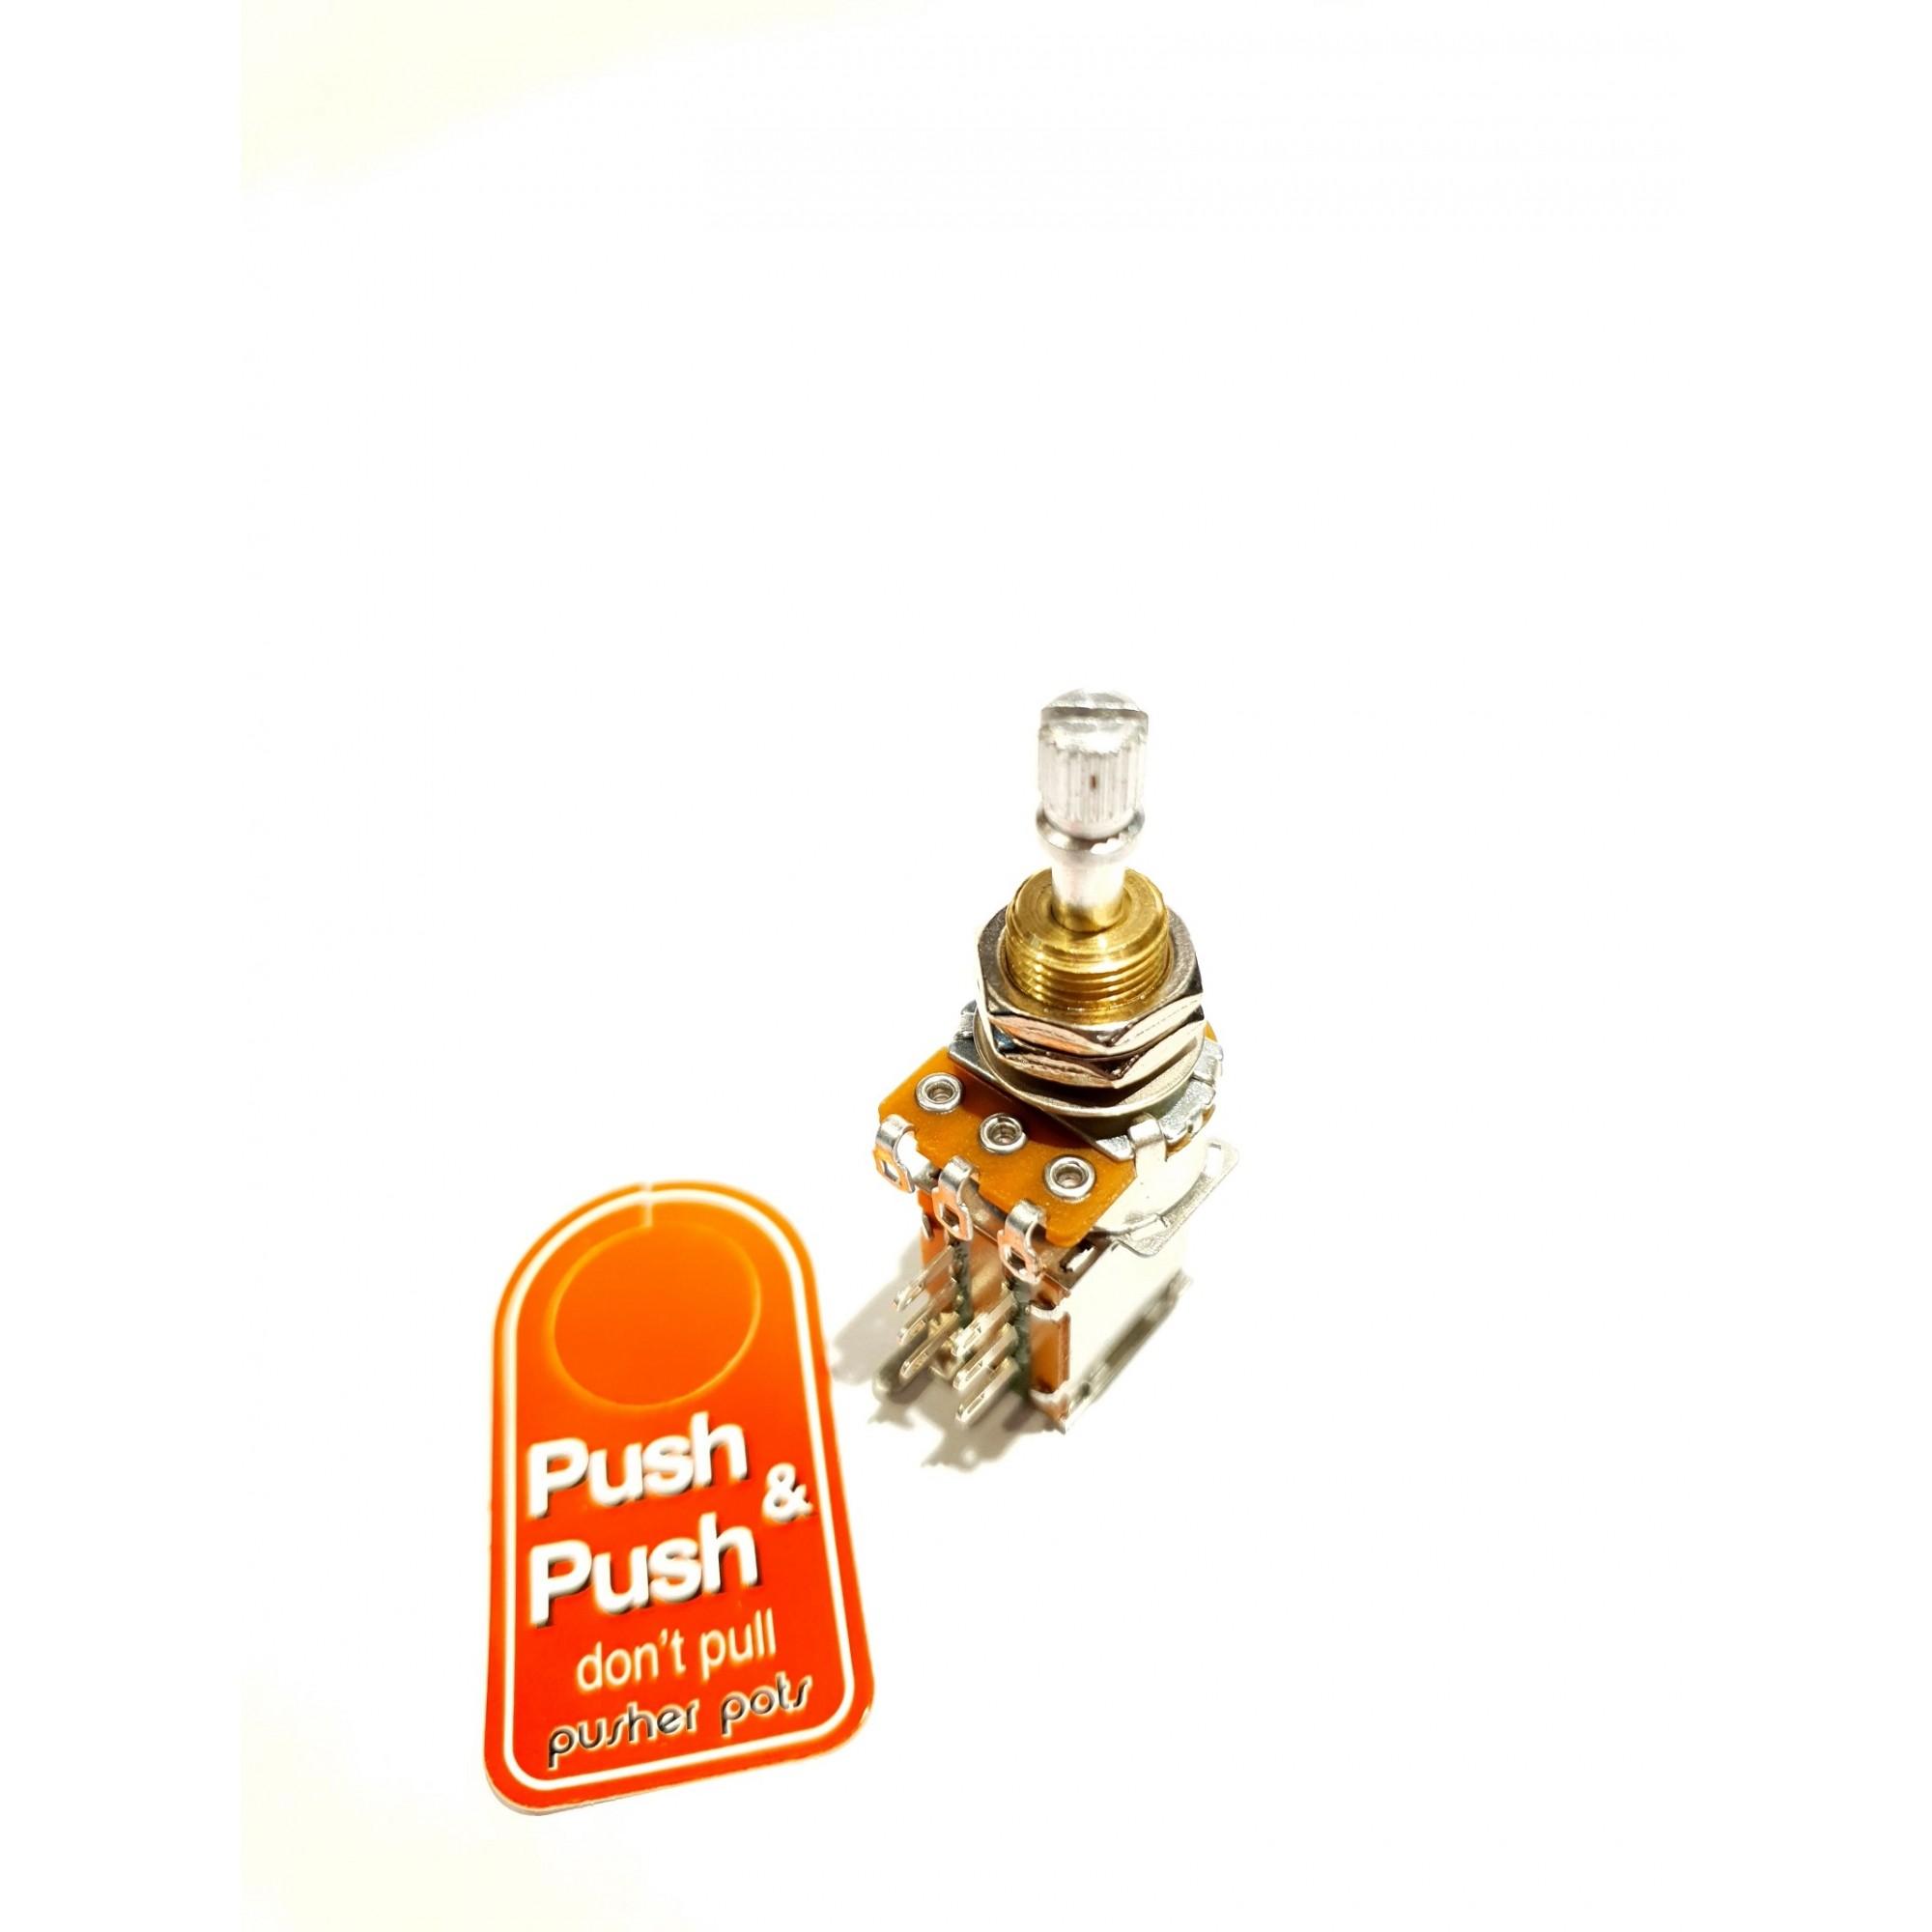 POTENCIOMETRO PUSH PUSH A500K LOGARITMO - CUSTOM SOUND